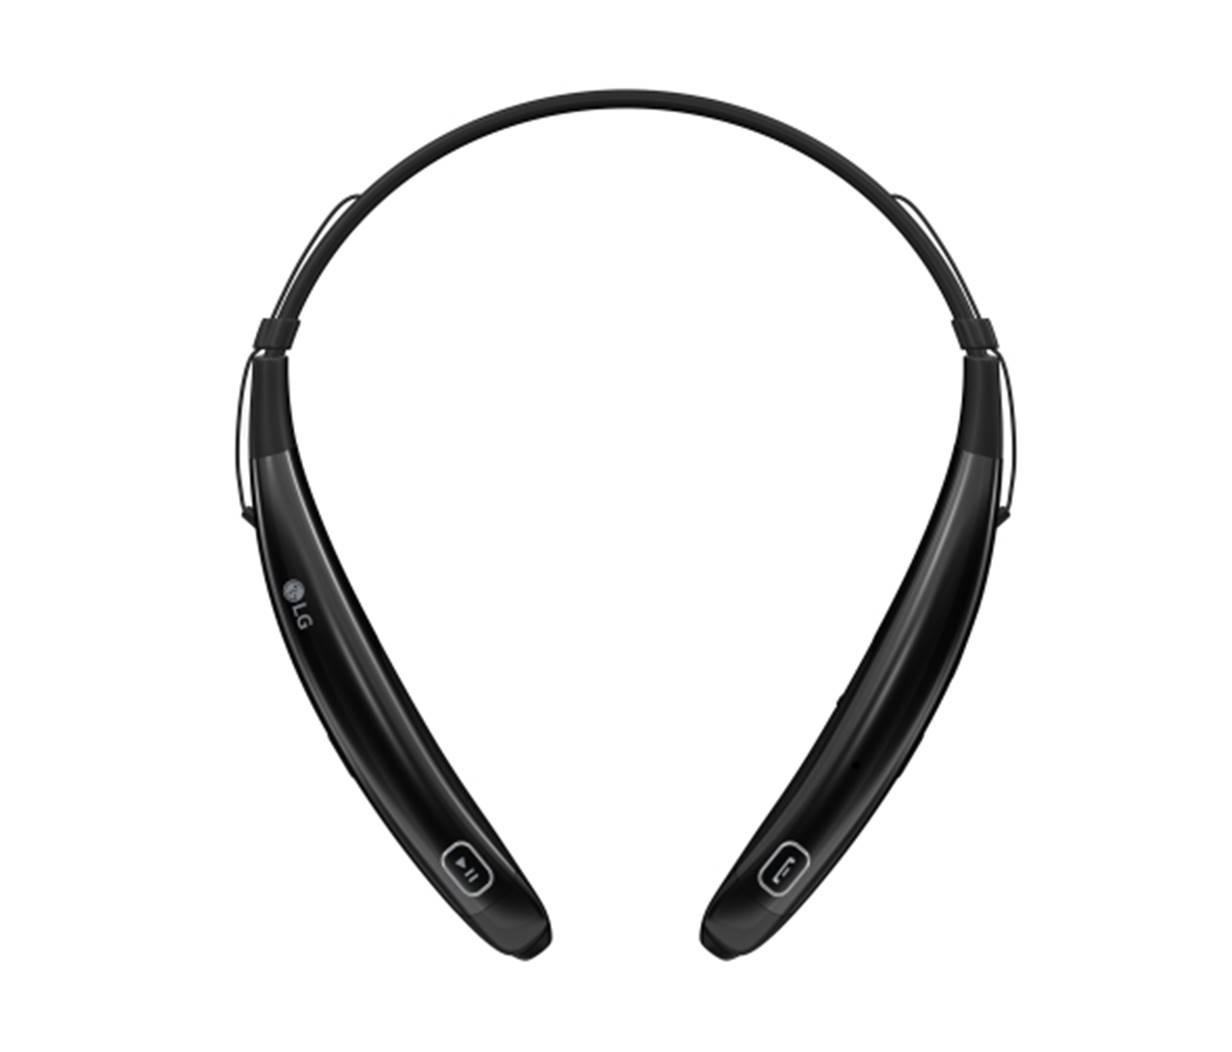 LG Tone Pro HBS 770 Bluetooth Headset